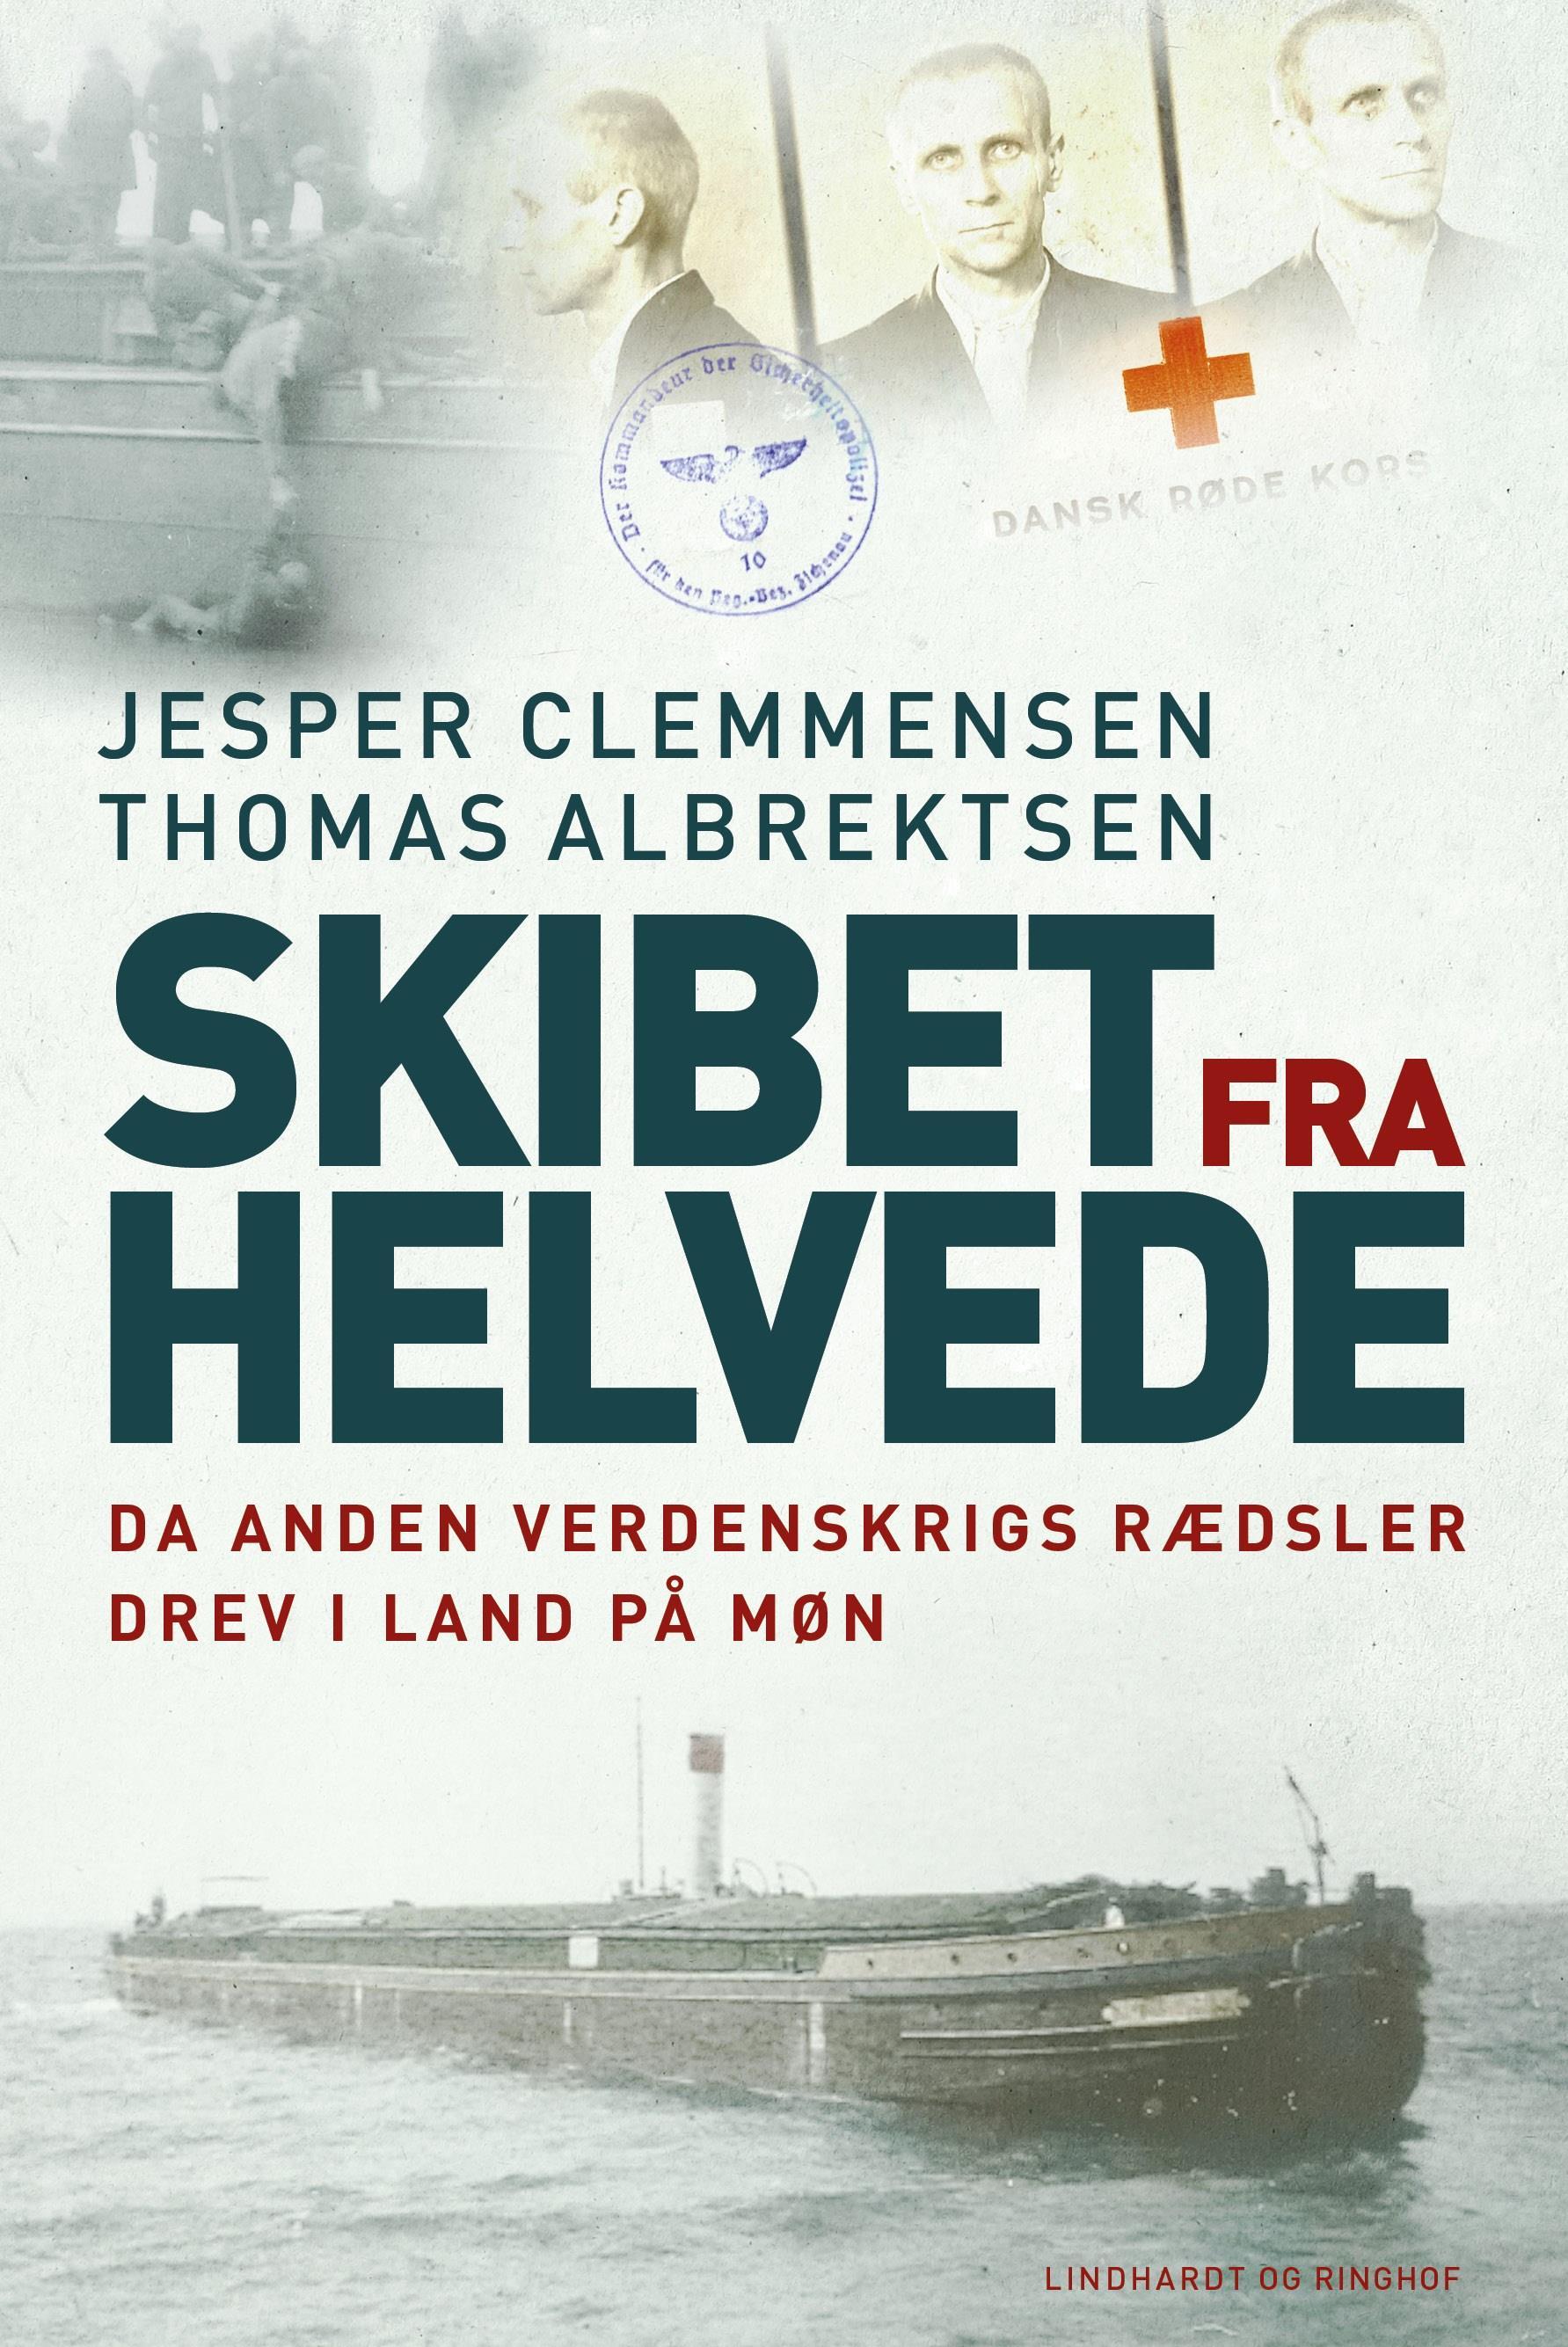 Skibet fra Helvede - Thomas Albrektsen; Jesper Clemmensen - Bøger - Lindhardt og Ringhof - 9788711909577 - May 3, 2021